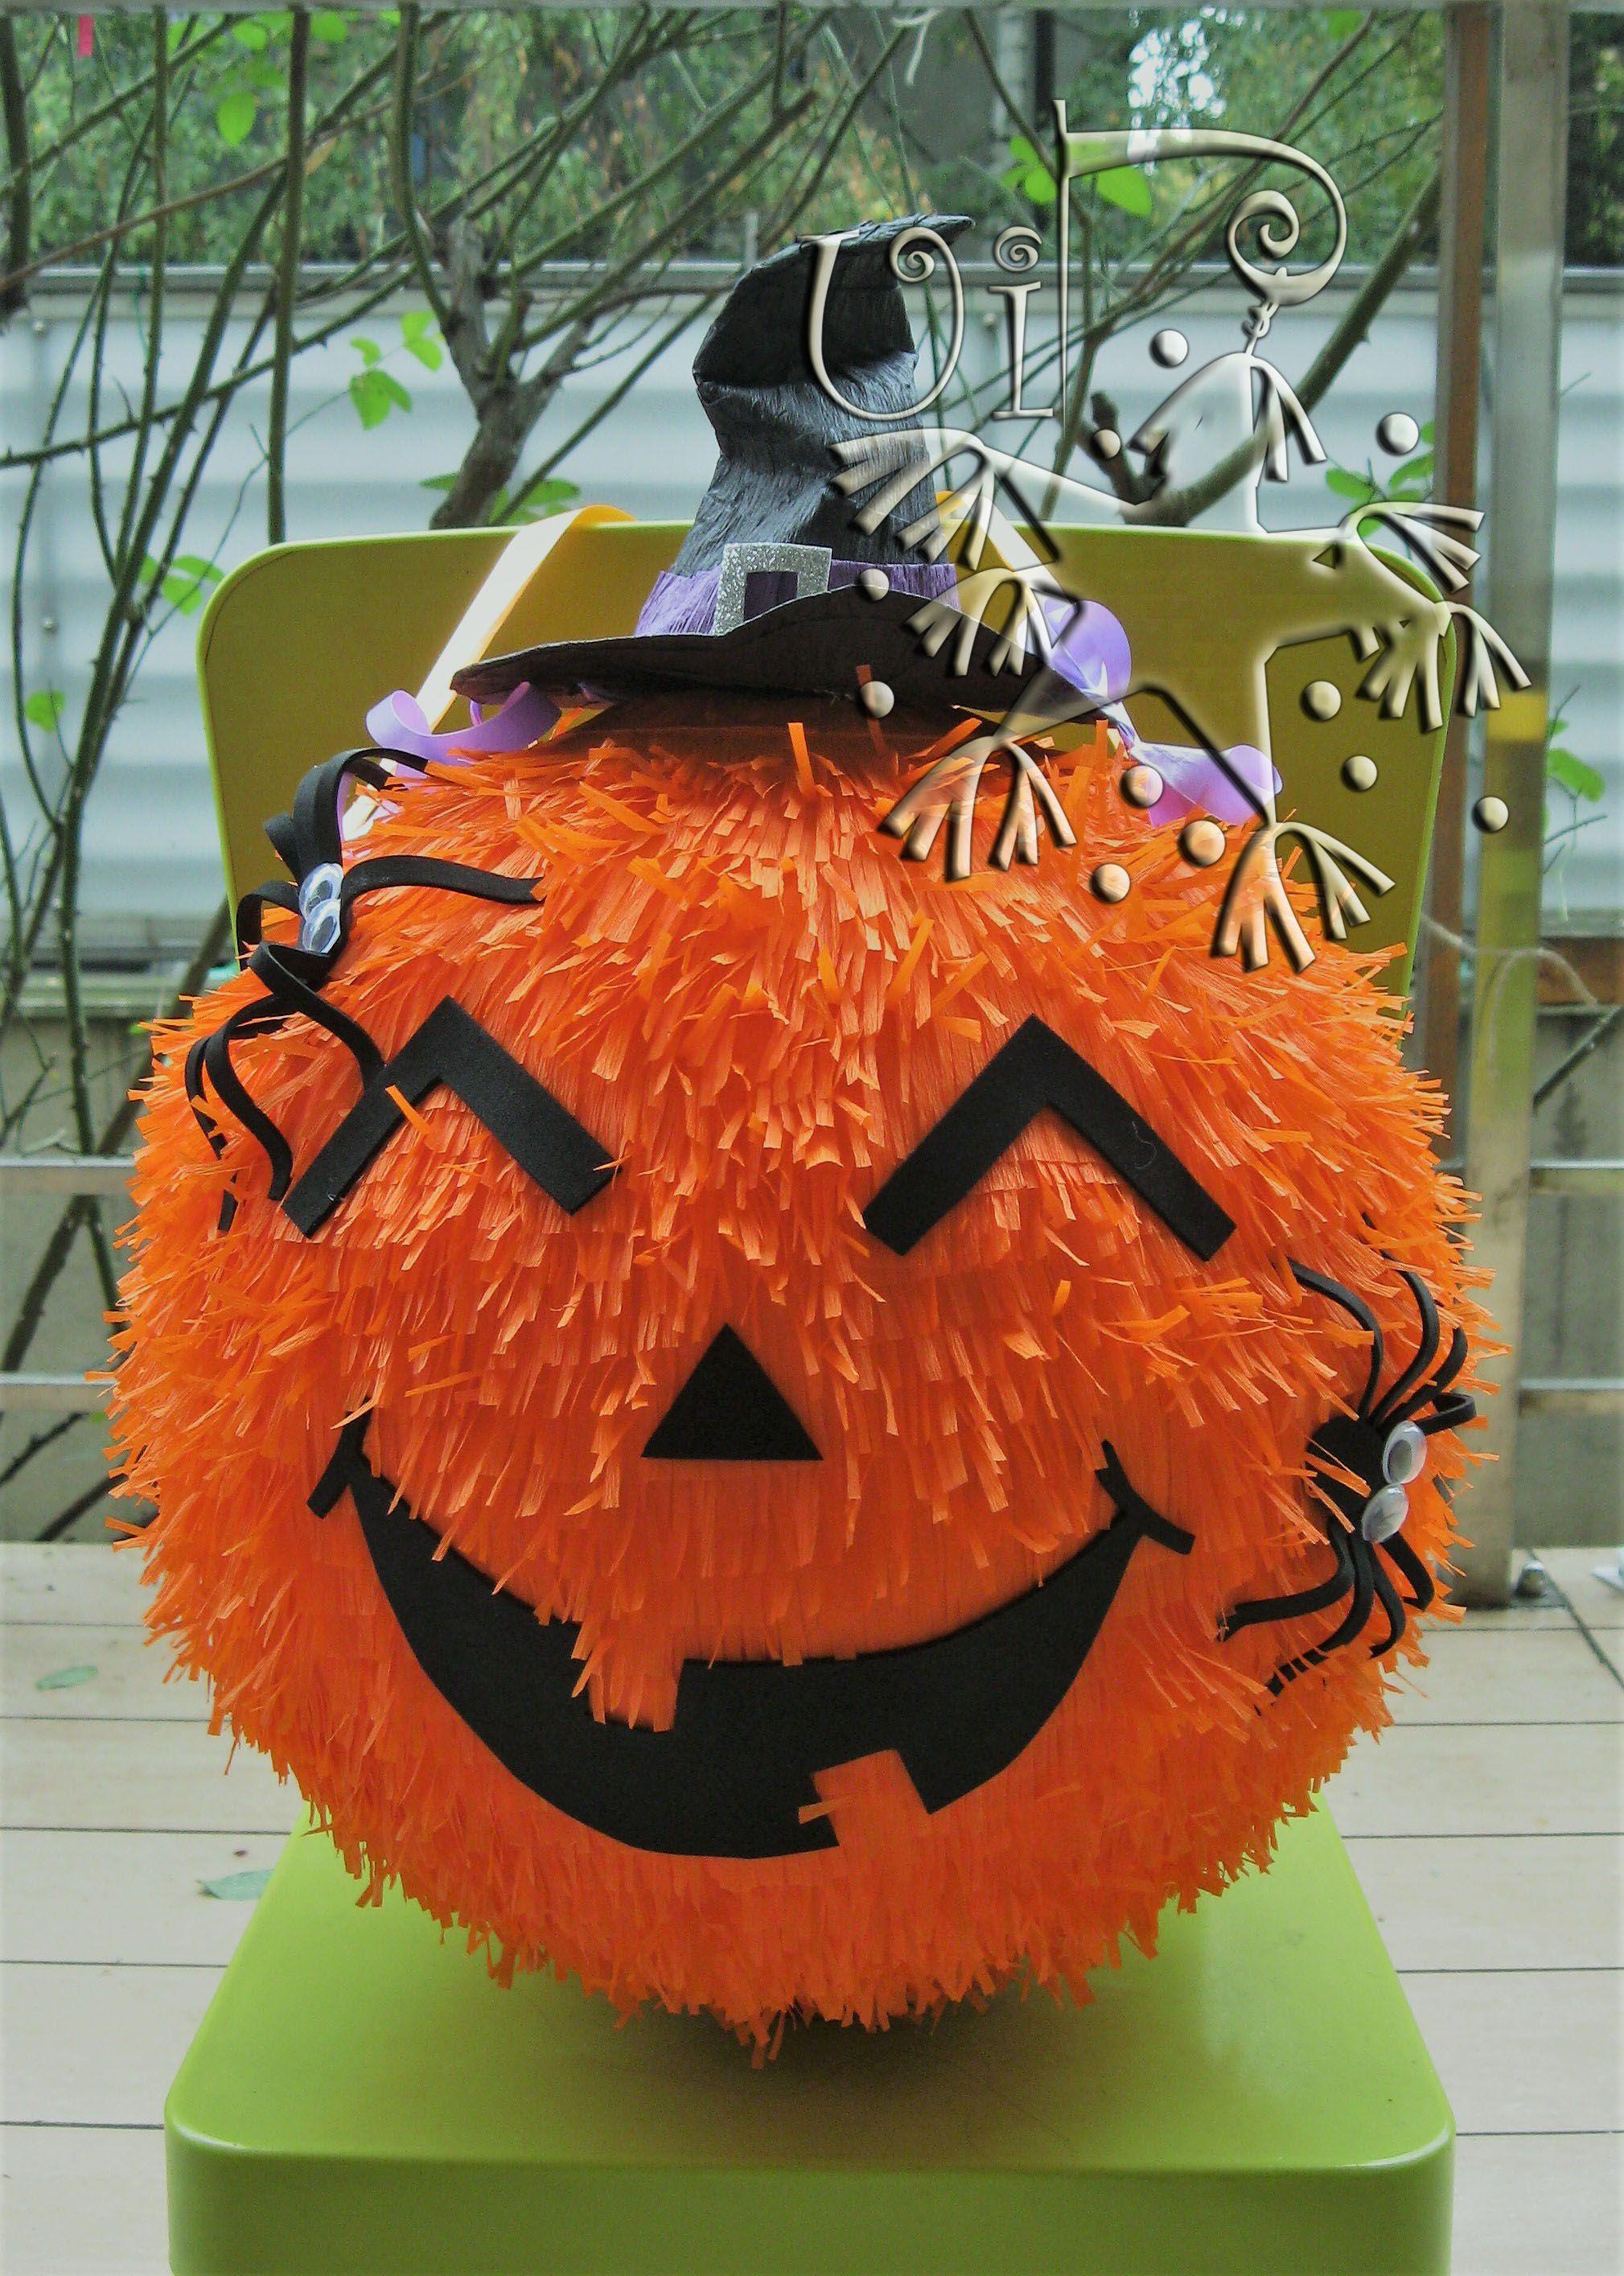 Pumpkin Halloween Pinata Birthday Halloween Party Kids Halloween Birthday Party Halloween Pinata